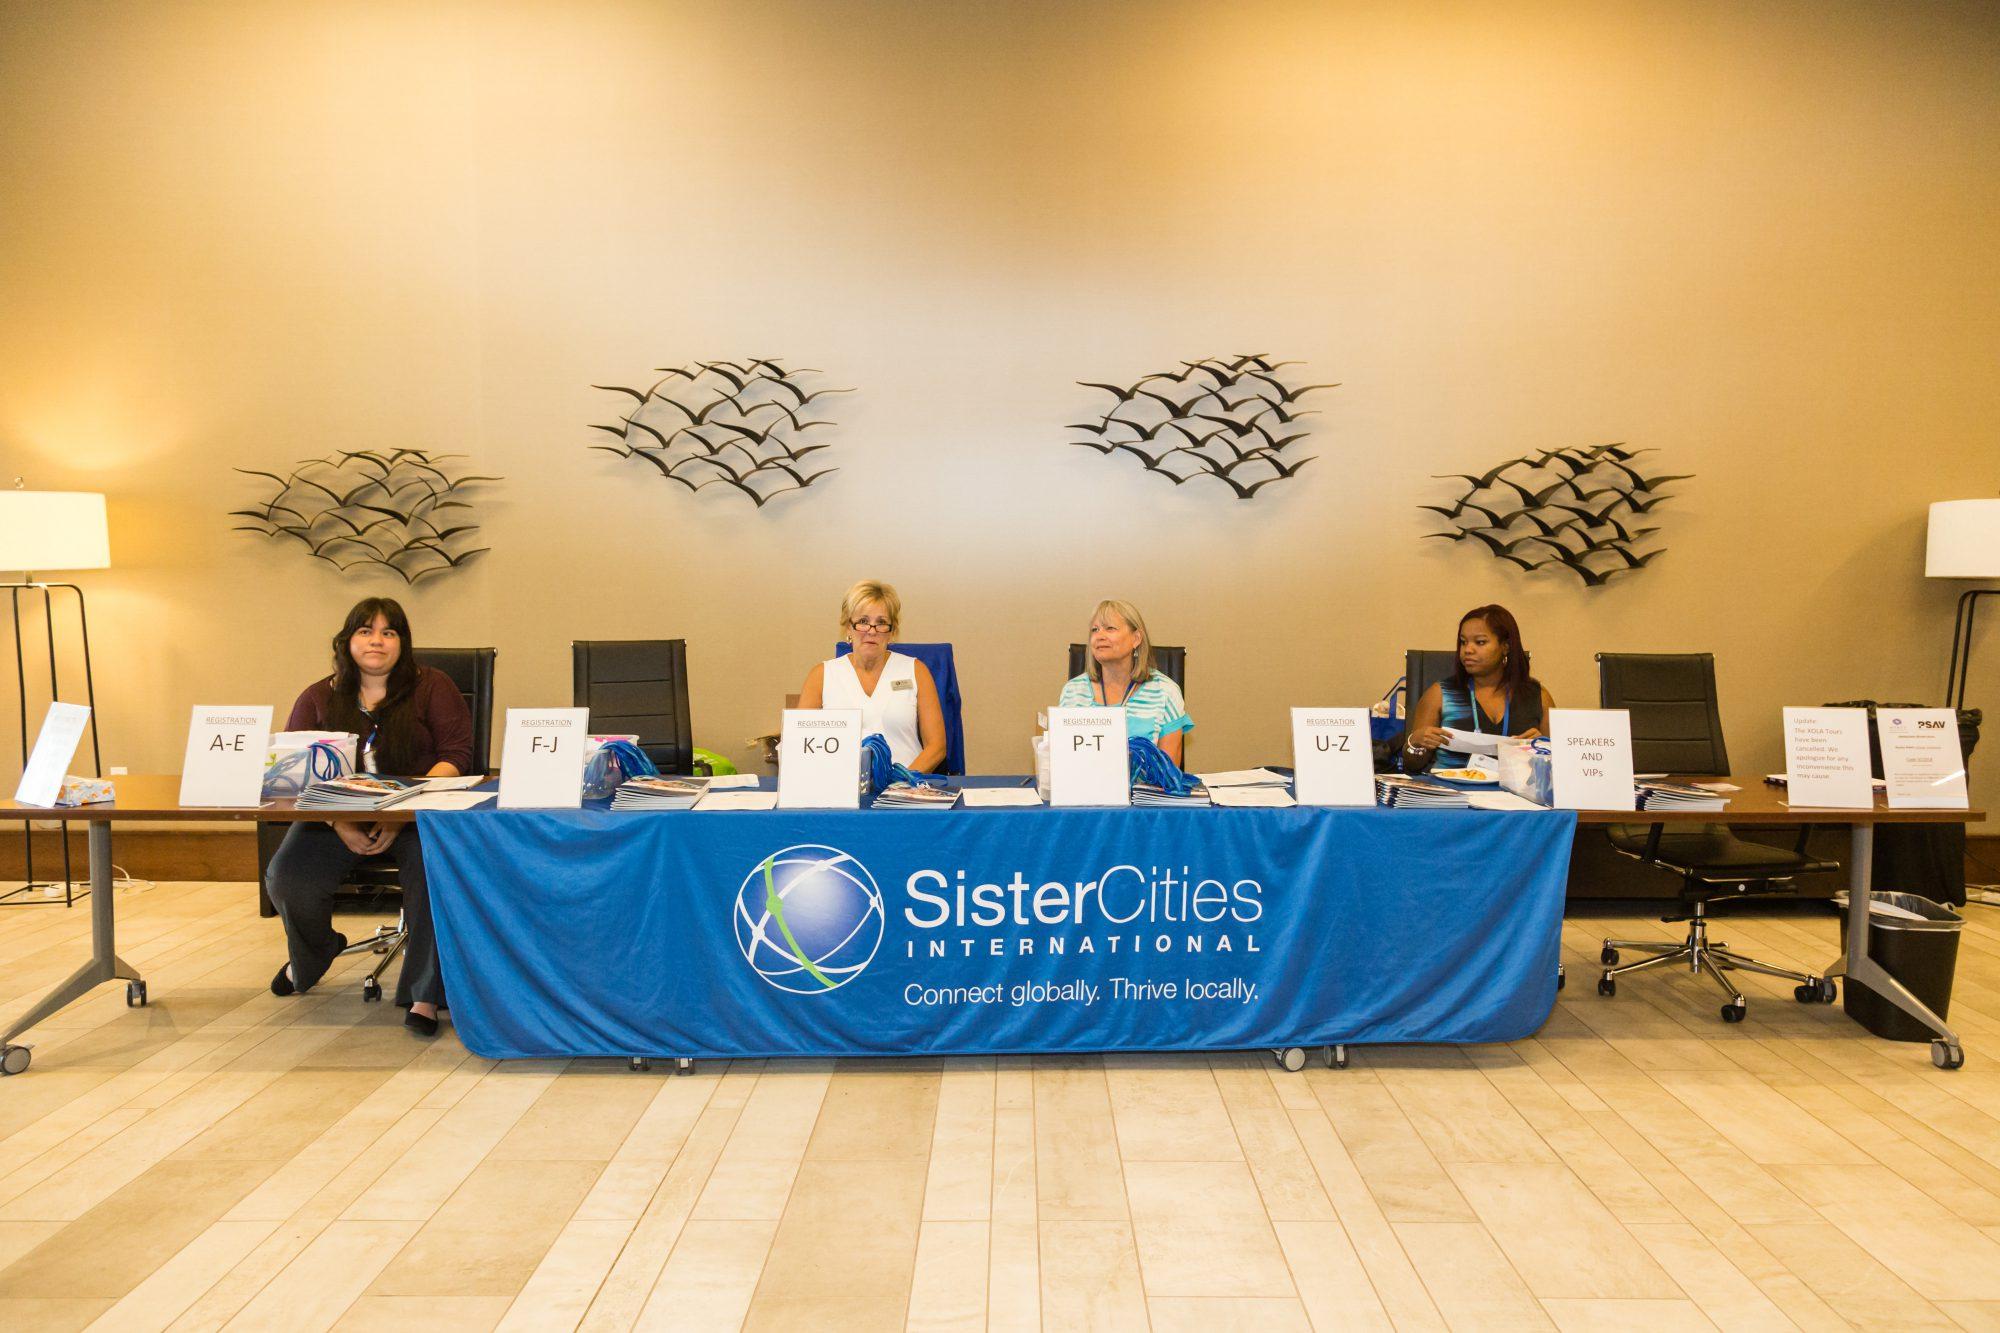 2018 Annual Conference Registration Desk